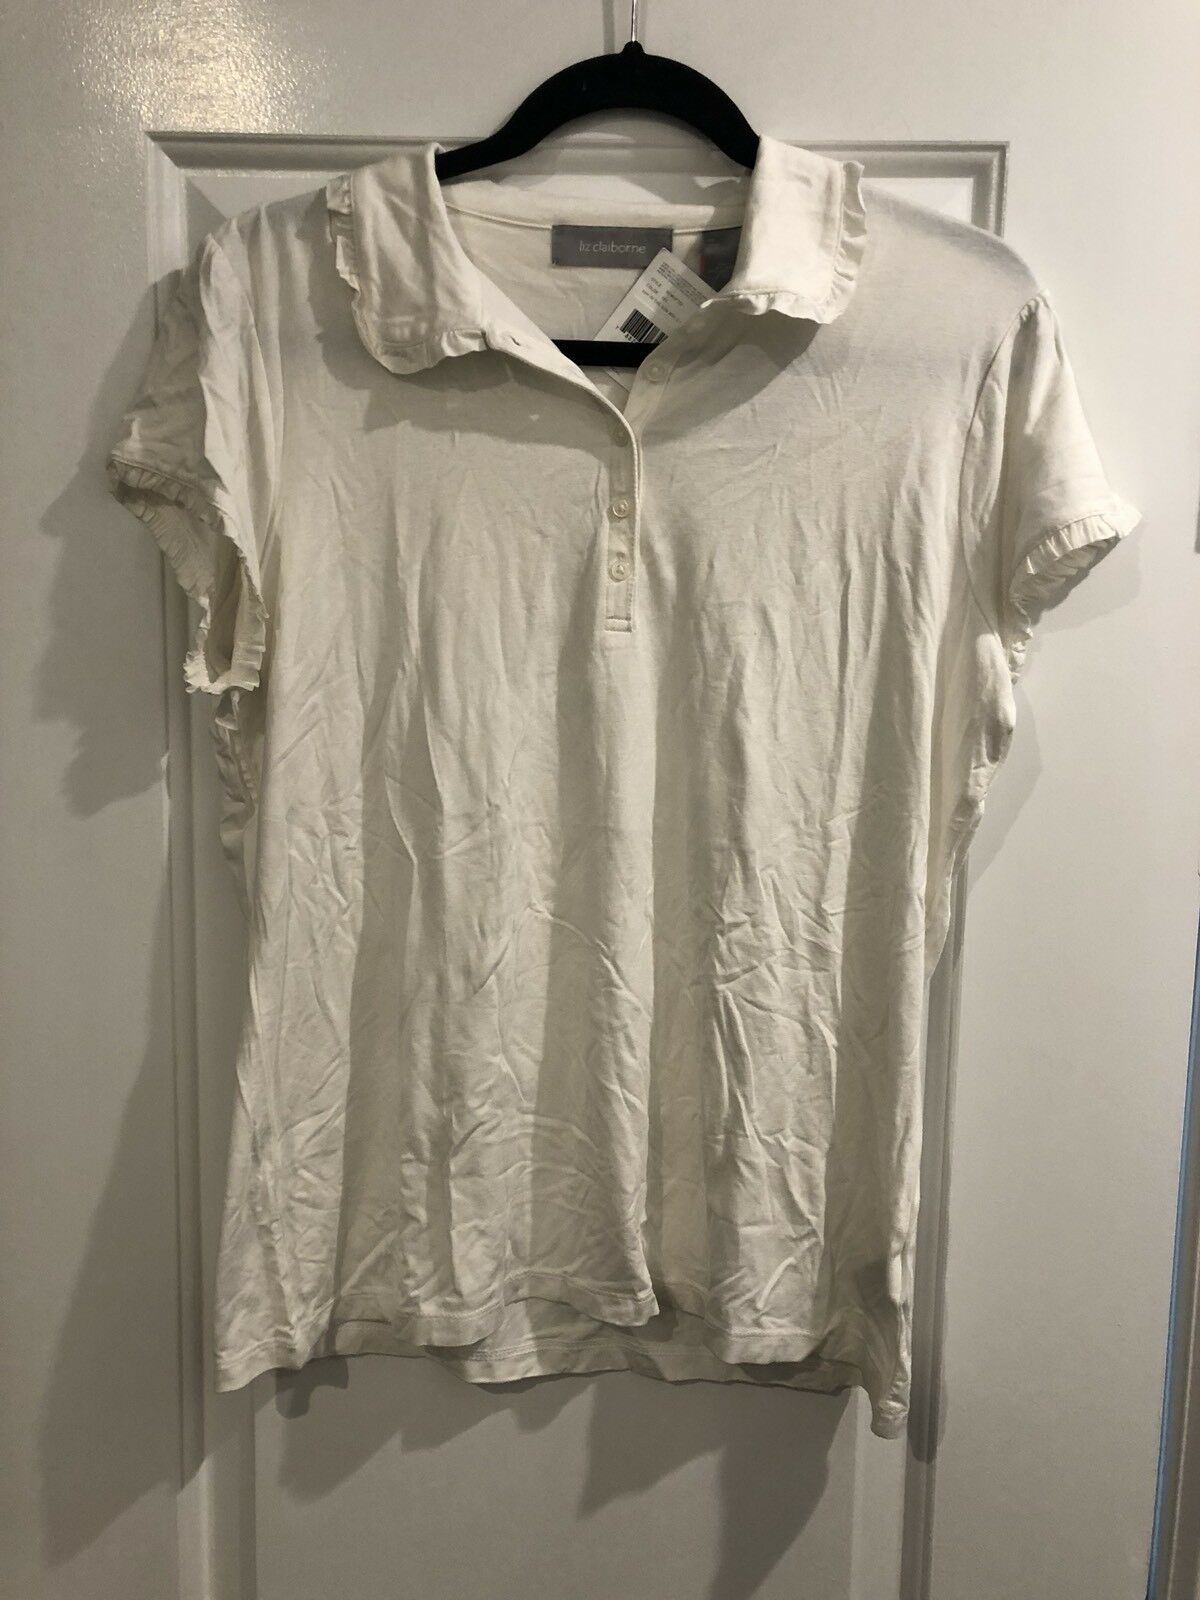 NWT Women's Liz Claiborne Stretch White Short Sleeve Collared Polo Shirt XL